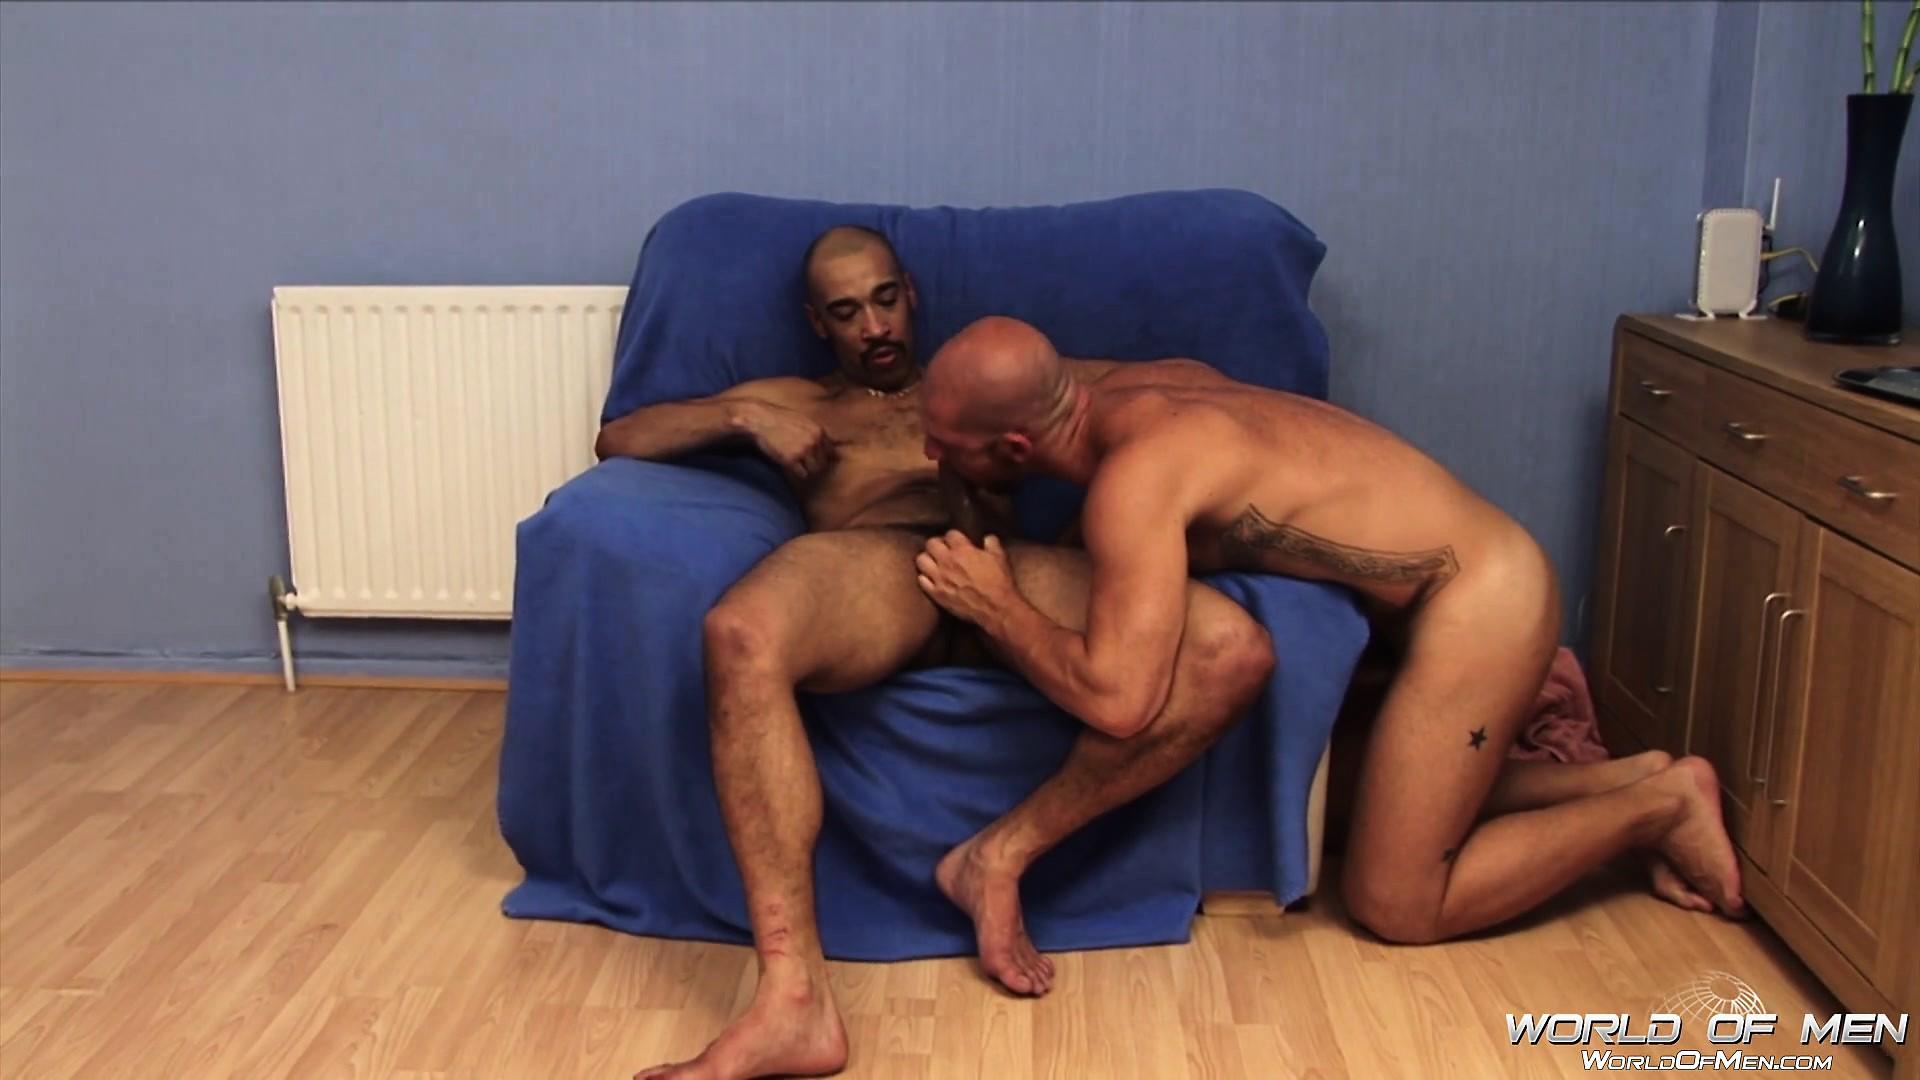 Aitor Crash Porno films porno gratuits et vidéos de sexe et films de cul